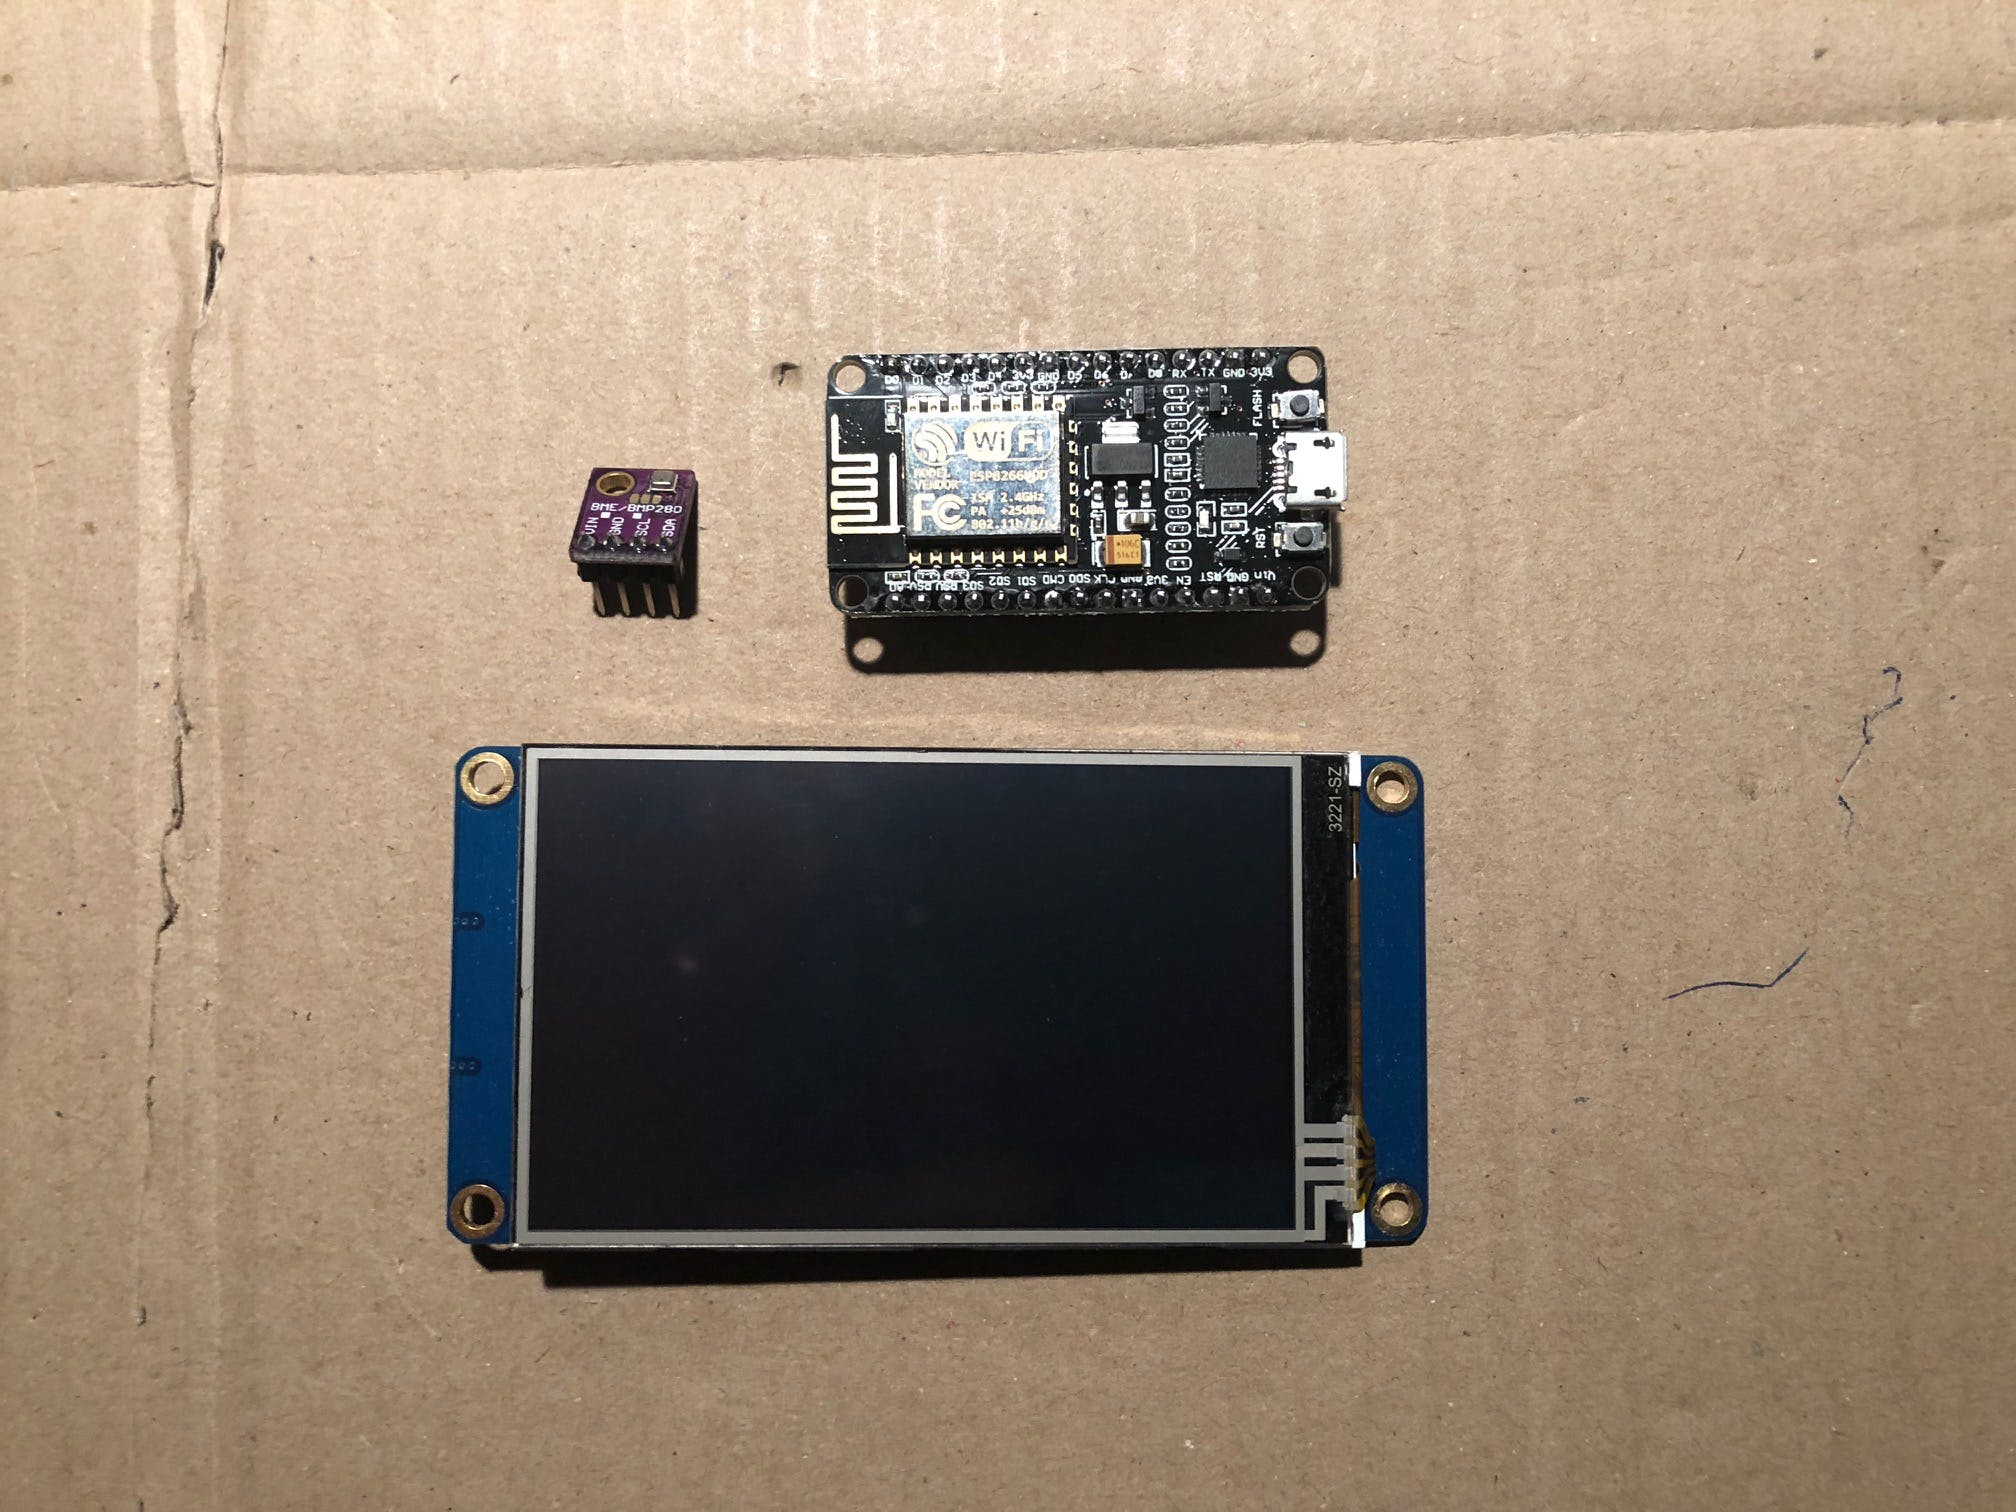 NodeMCU, BME280 and Nextion display